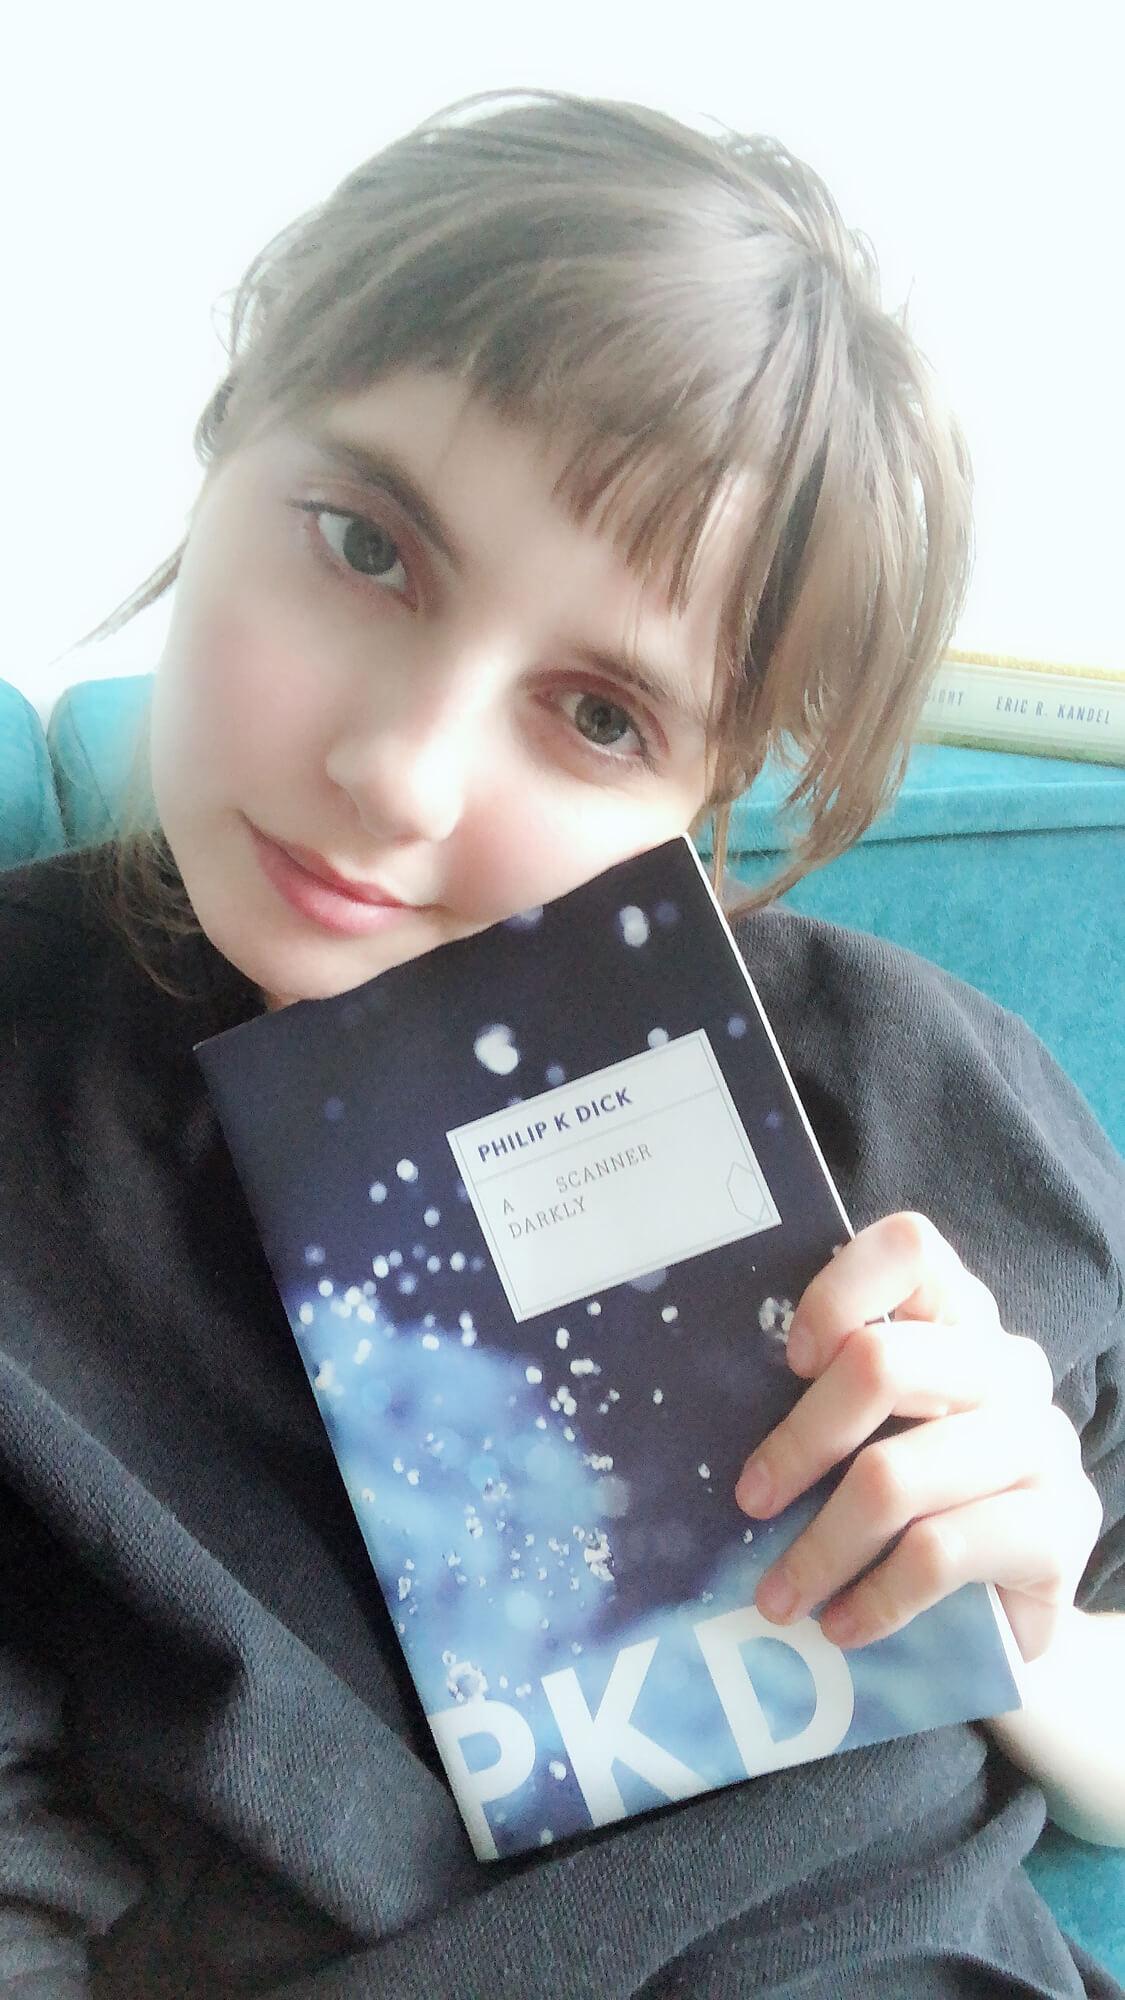 https://liararoux.xxx/wp-content/uploads/2018/10/Liara-Roux-Selfies-and-Snapshots-September-2018-042.jpg